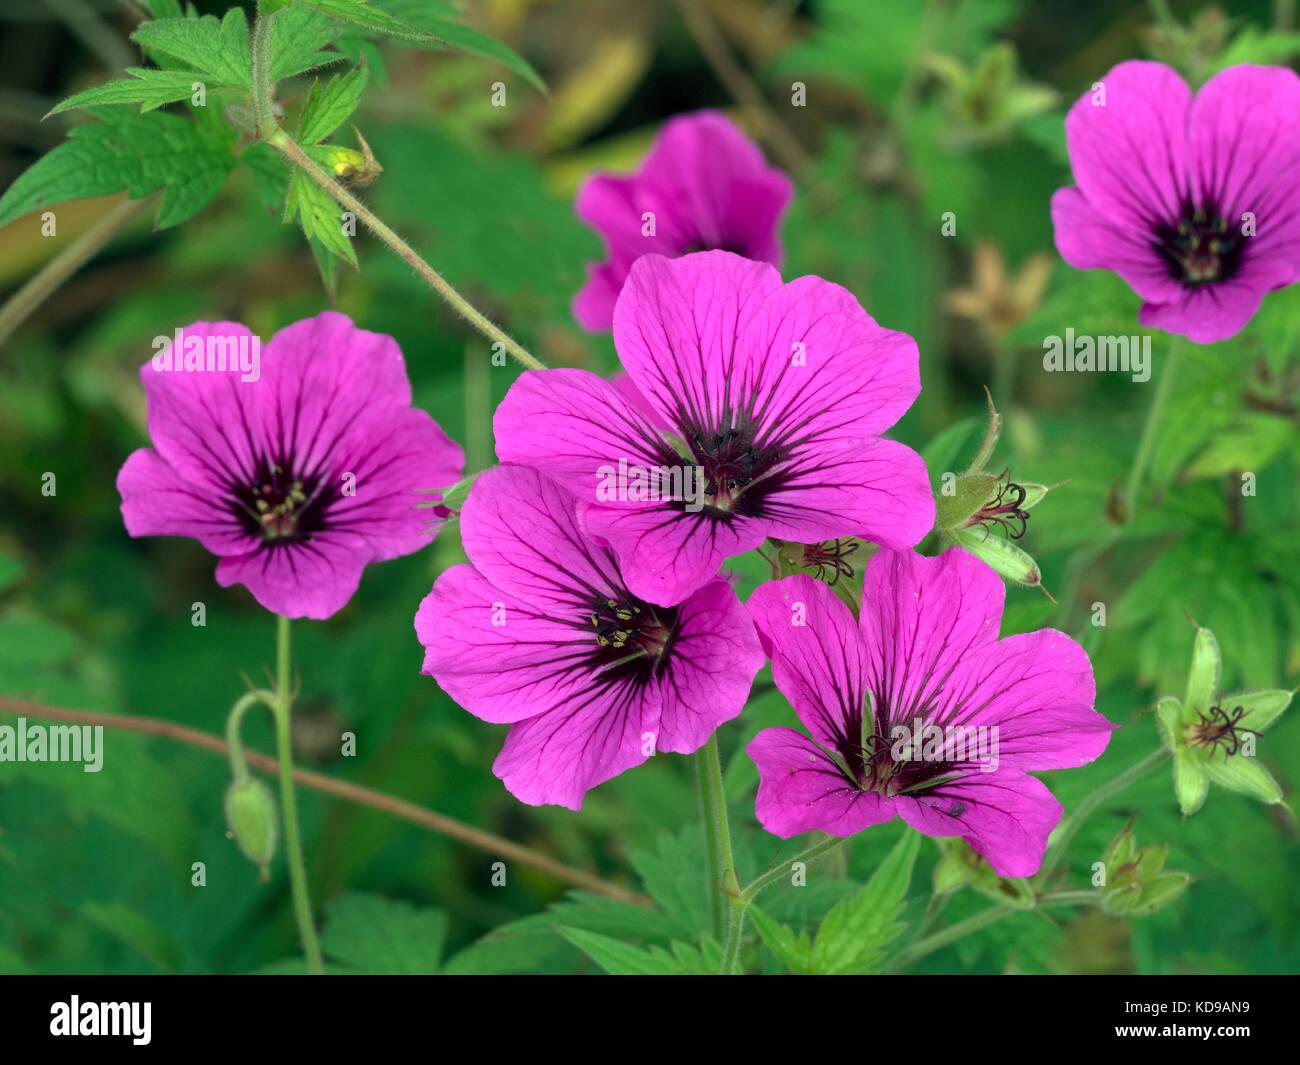 Geranium 'Patricia' in mixed herbaceous border - Stock Image